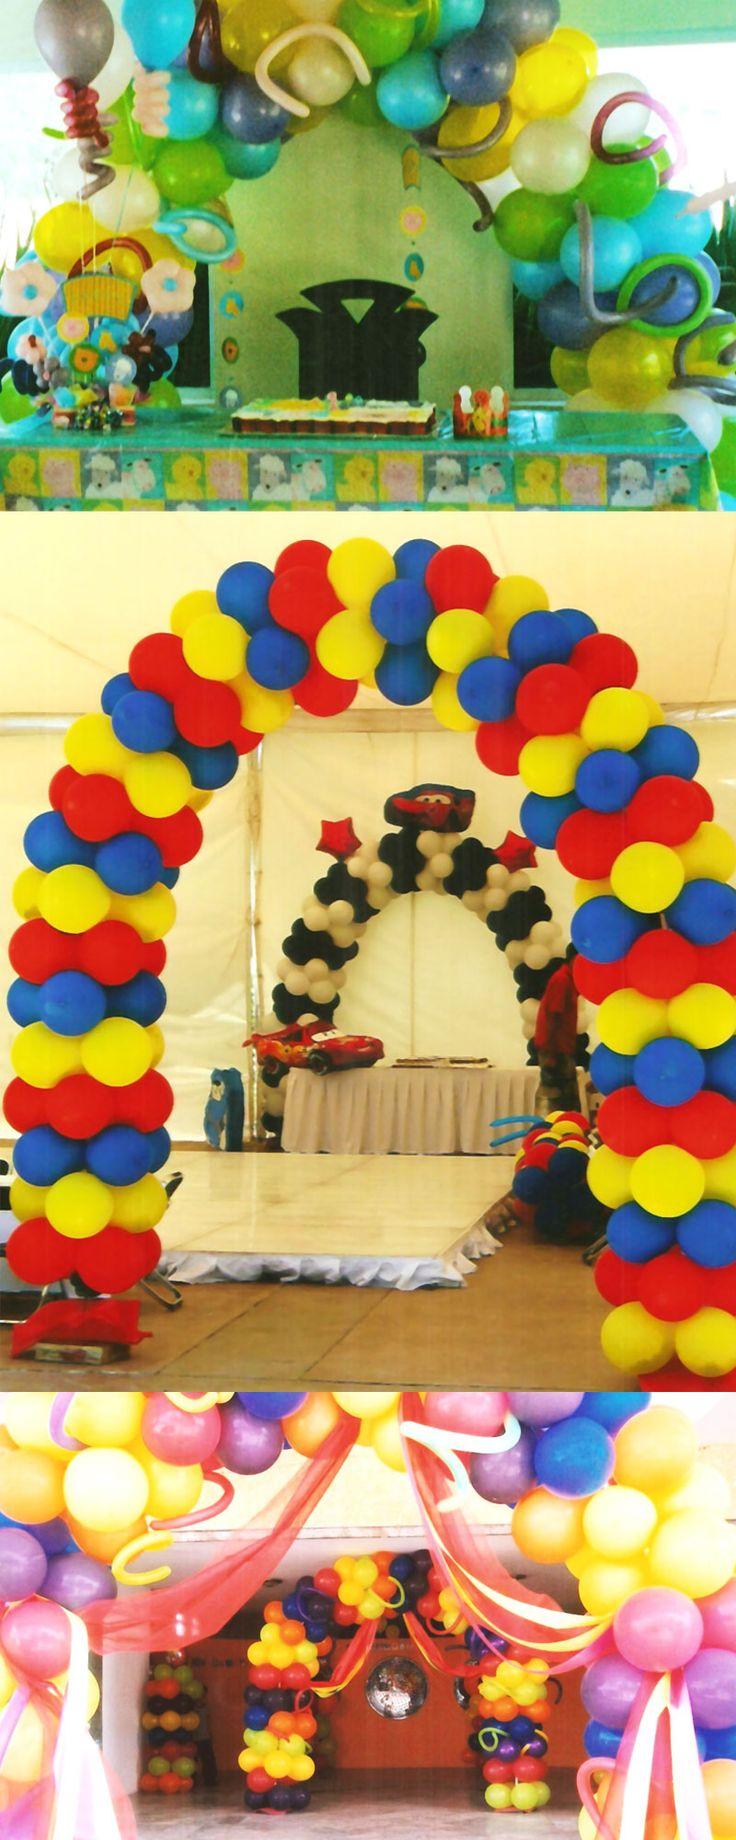 1000 images about arcos de globos on pinterest - Globos para fiestas ...